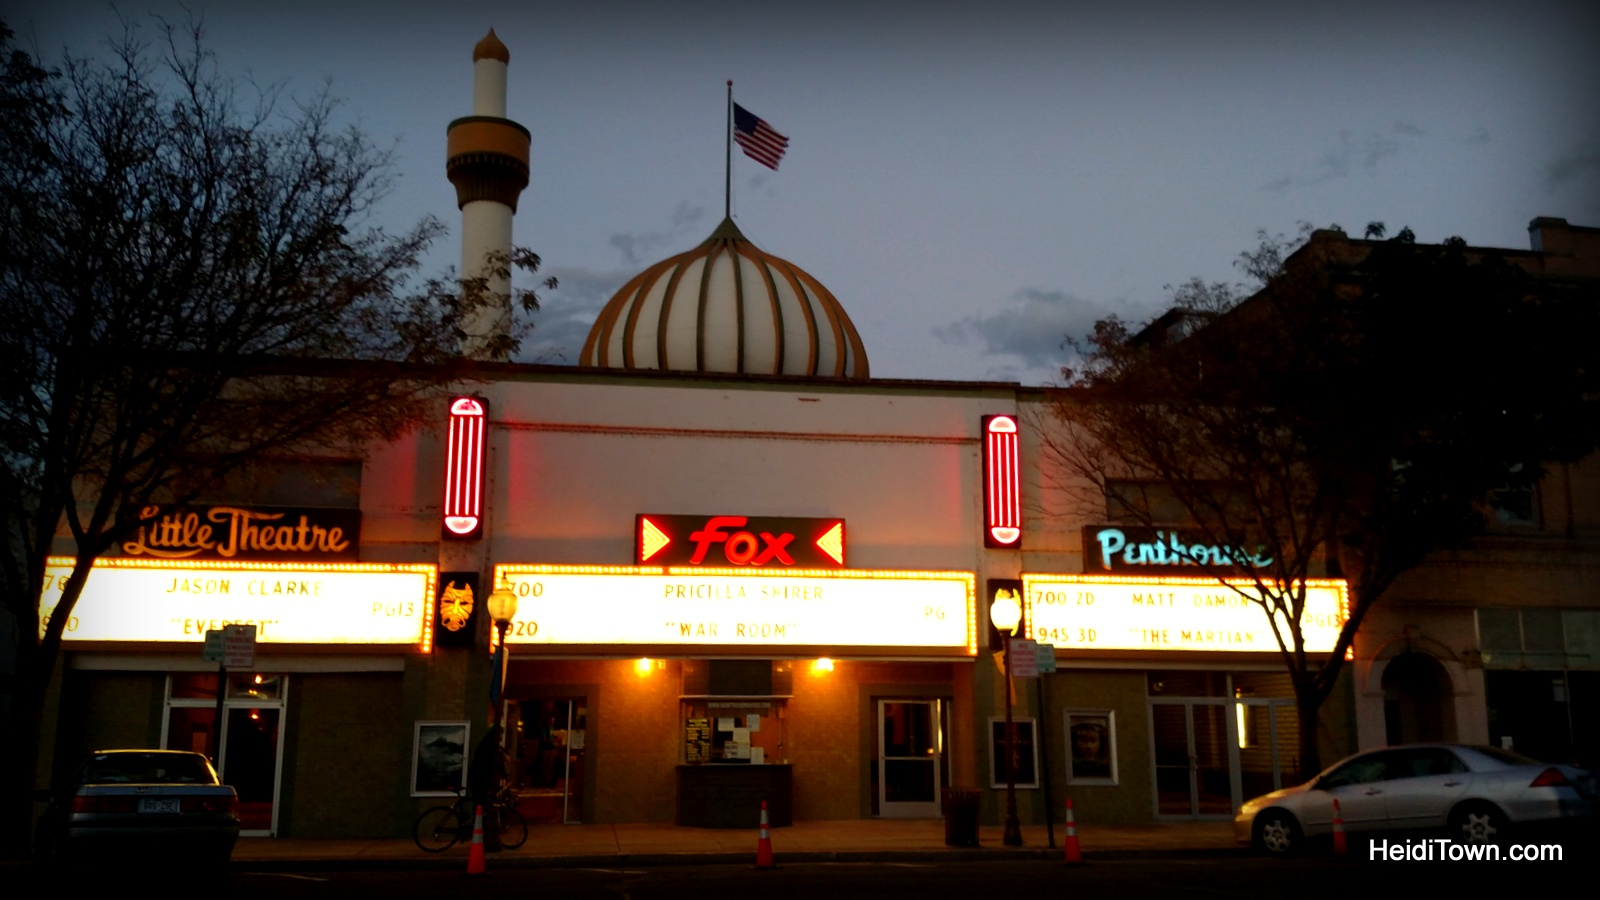 Fox Theater in Montrose, Colorado. HeidiTown.com